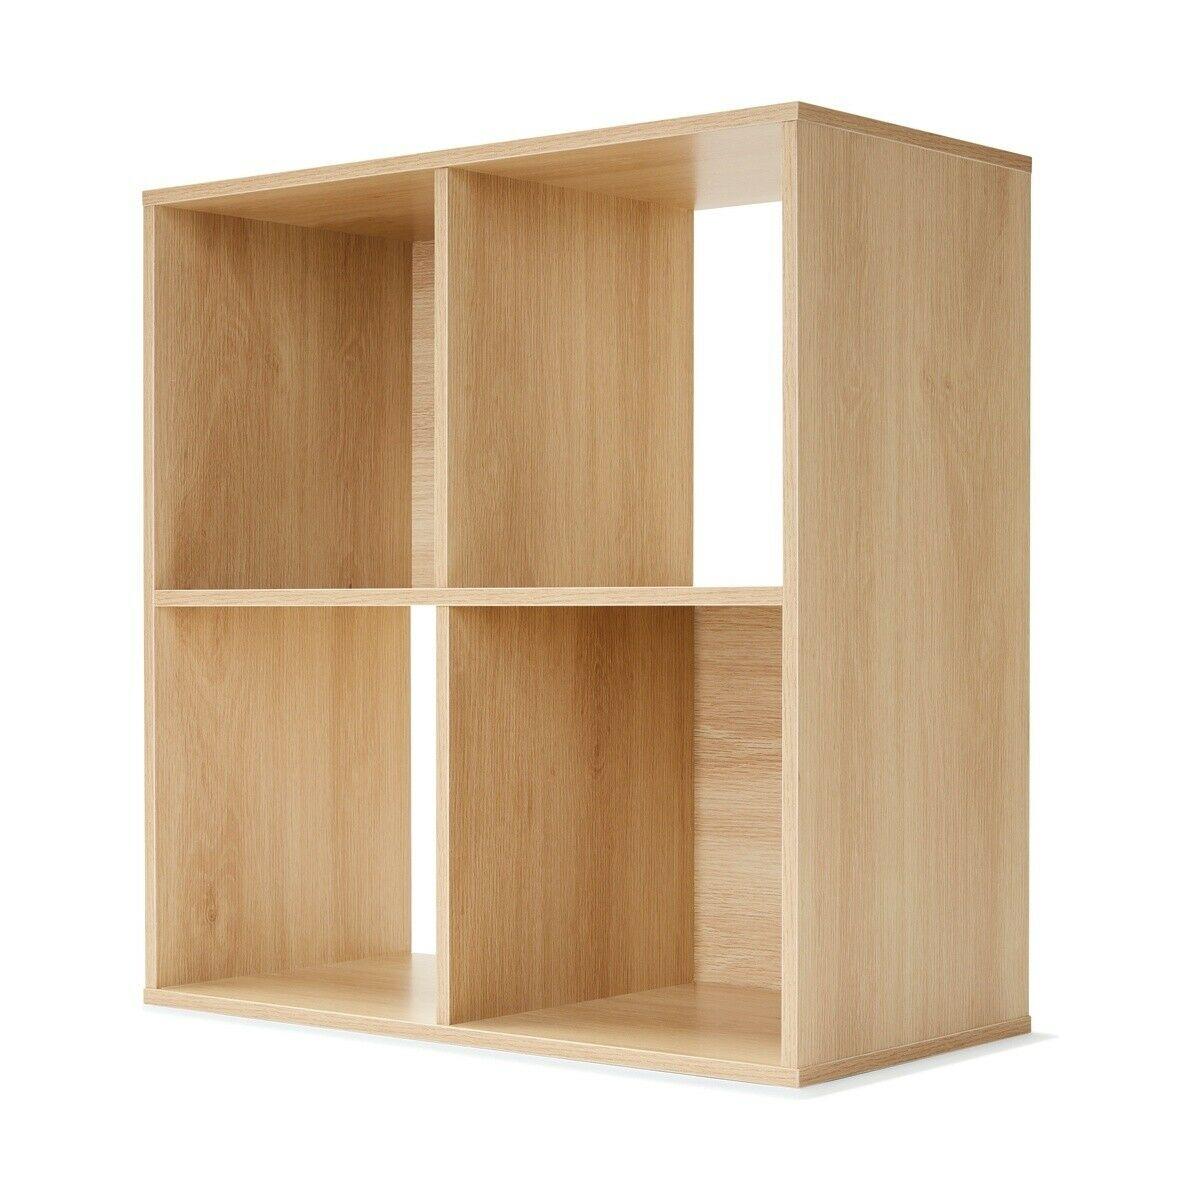 4 Cube Wooden Gloss Storage Bookshelf Bookcase Display Unit Natural Oak Look